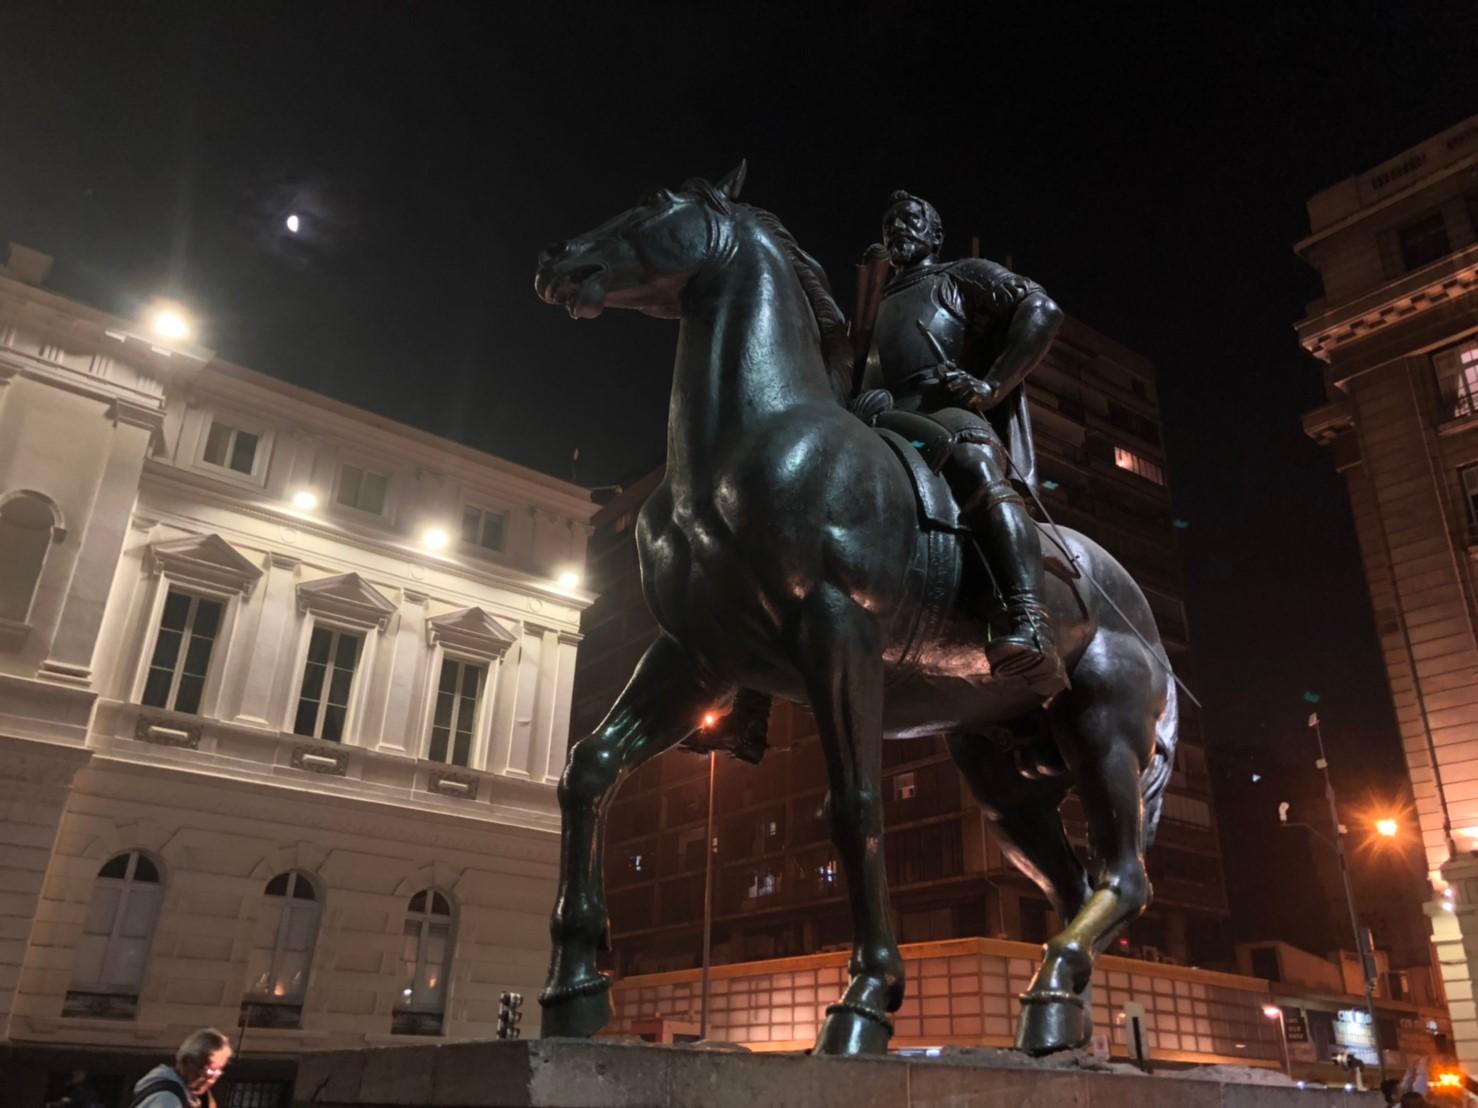 4.20 - Night, Horse statue.jpg